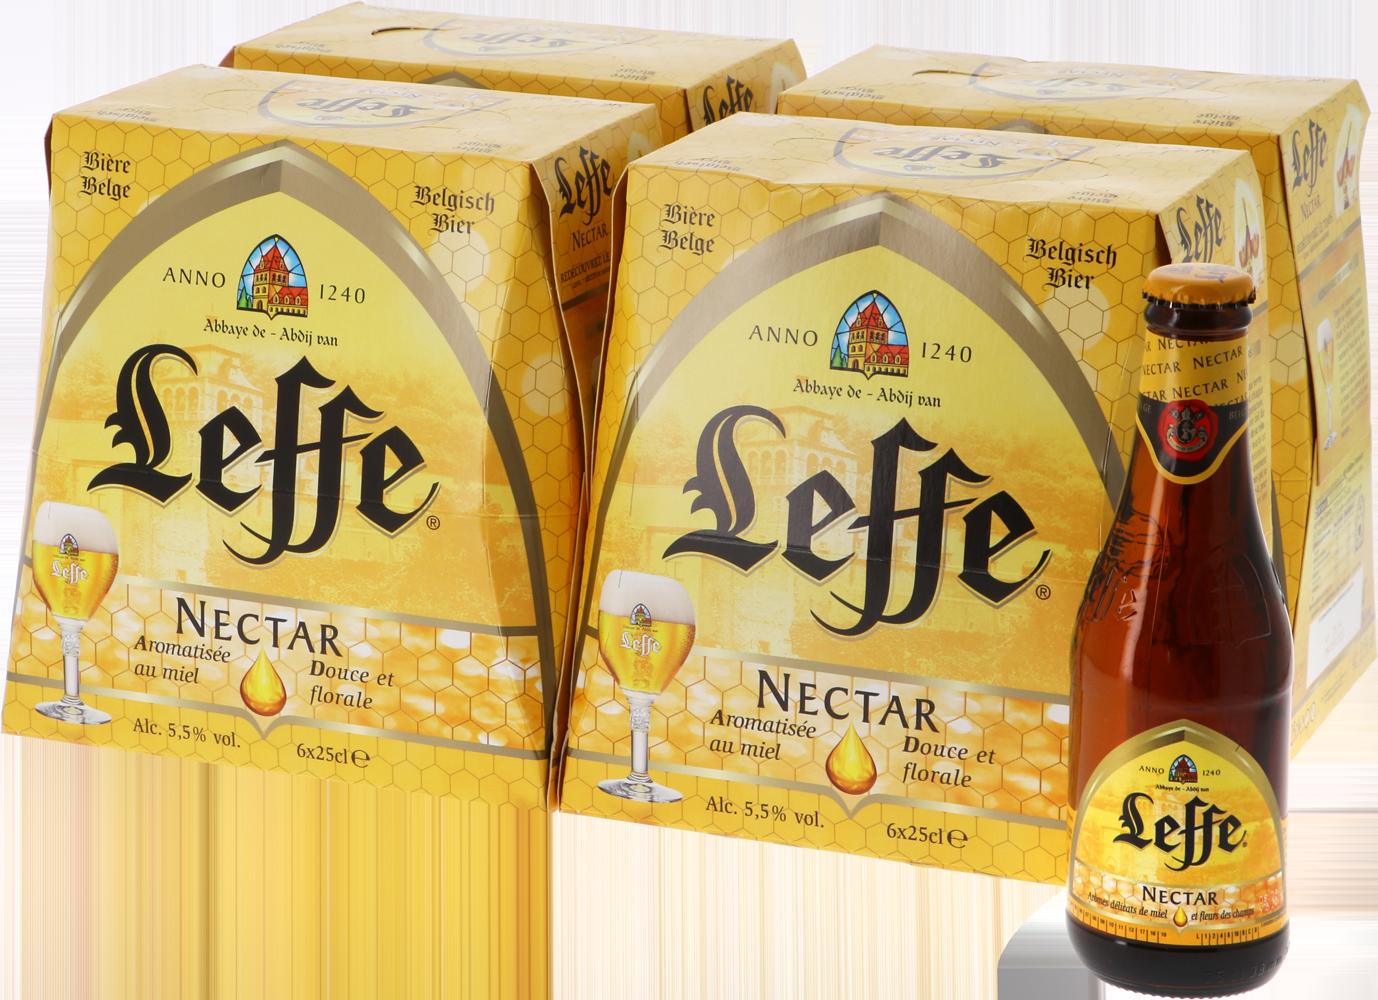 Big Pack Leffe Nectar - 24 bières